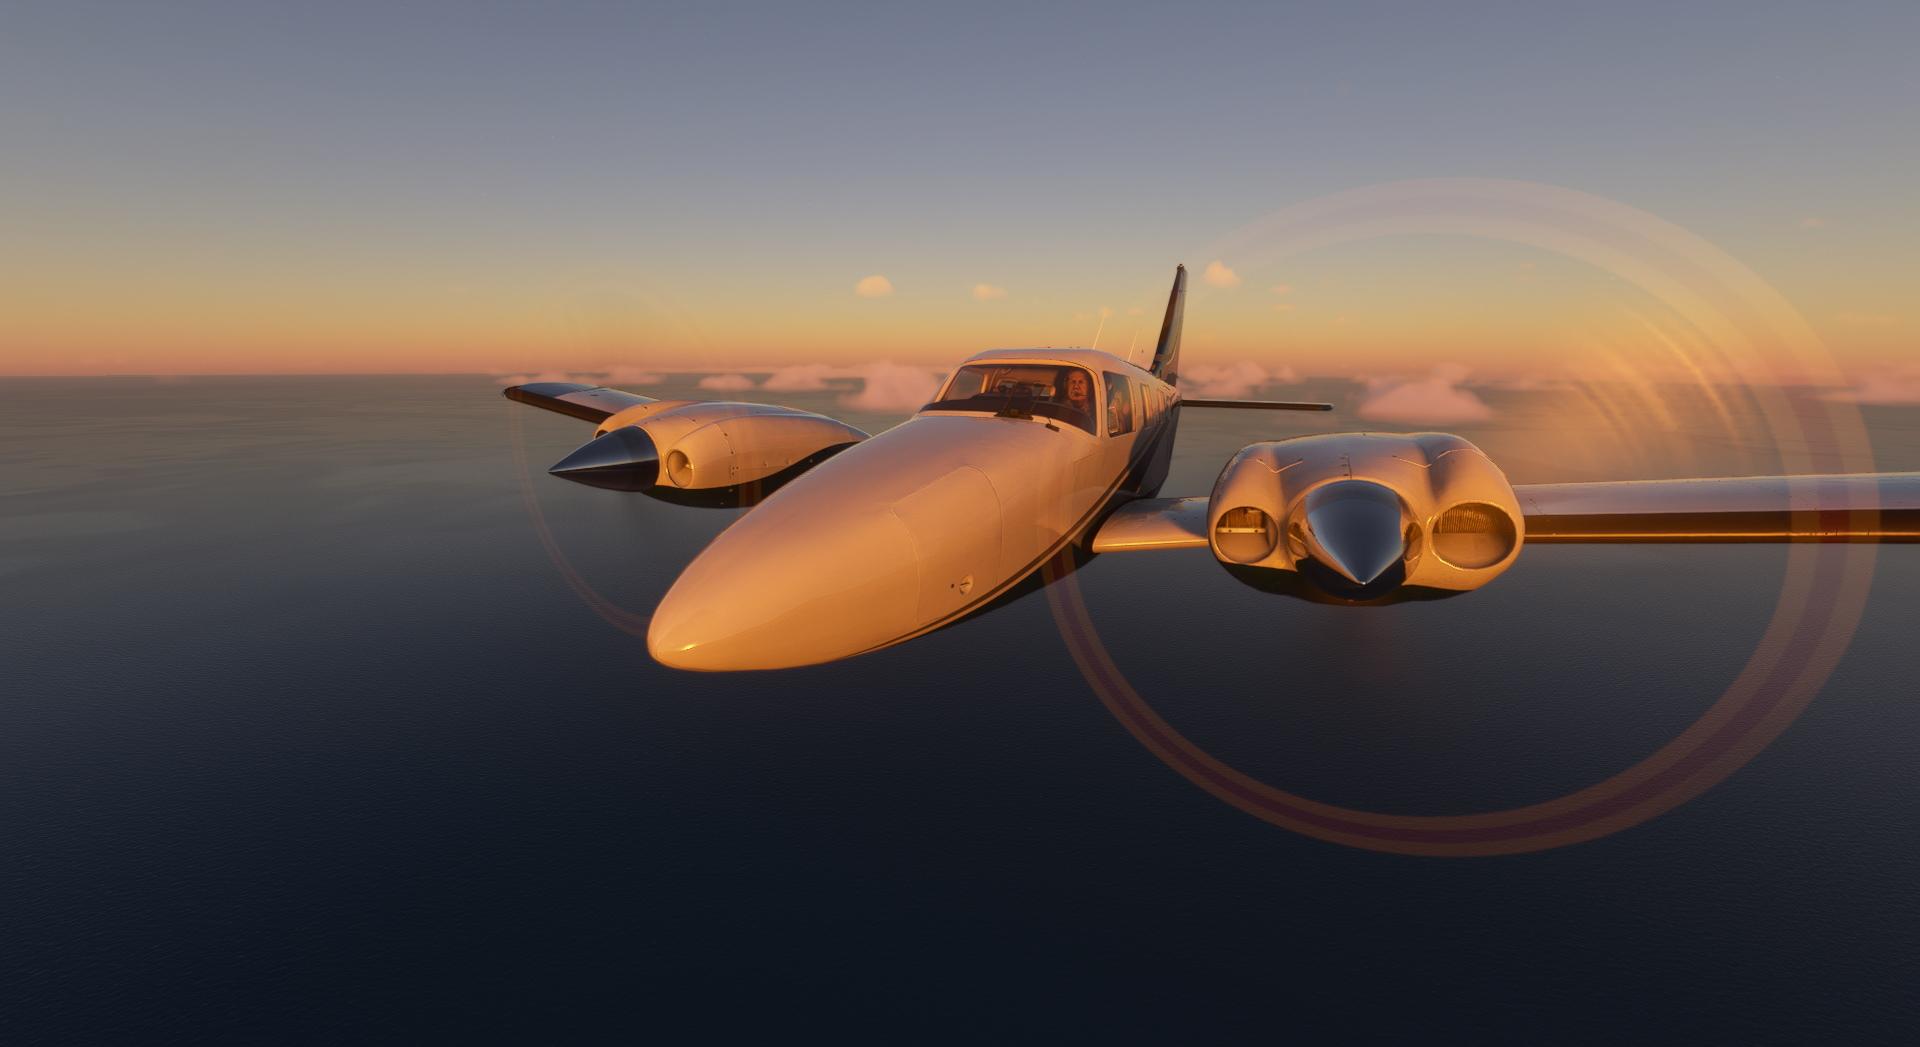 Microsoft Flight Simulator Carenado Pa34t Seneca V Sunrise Front View